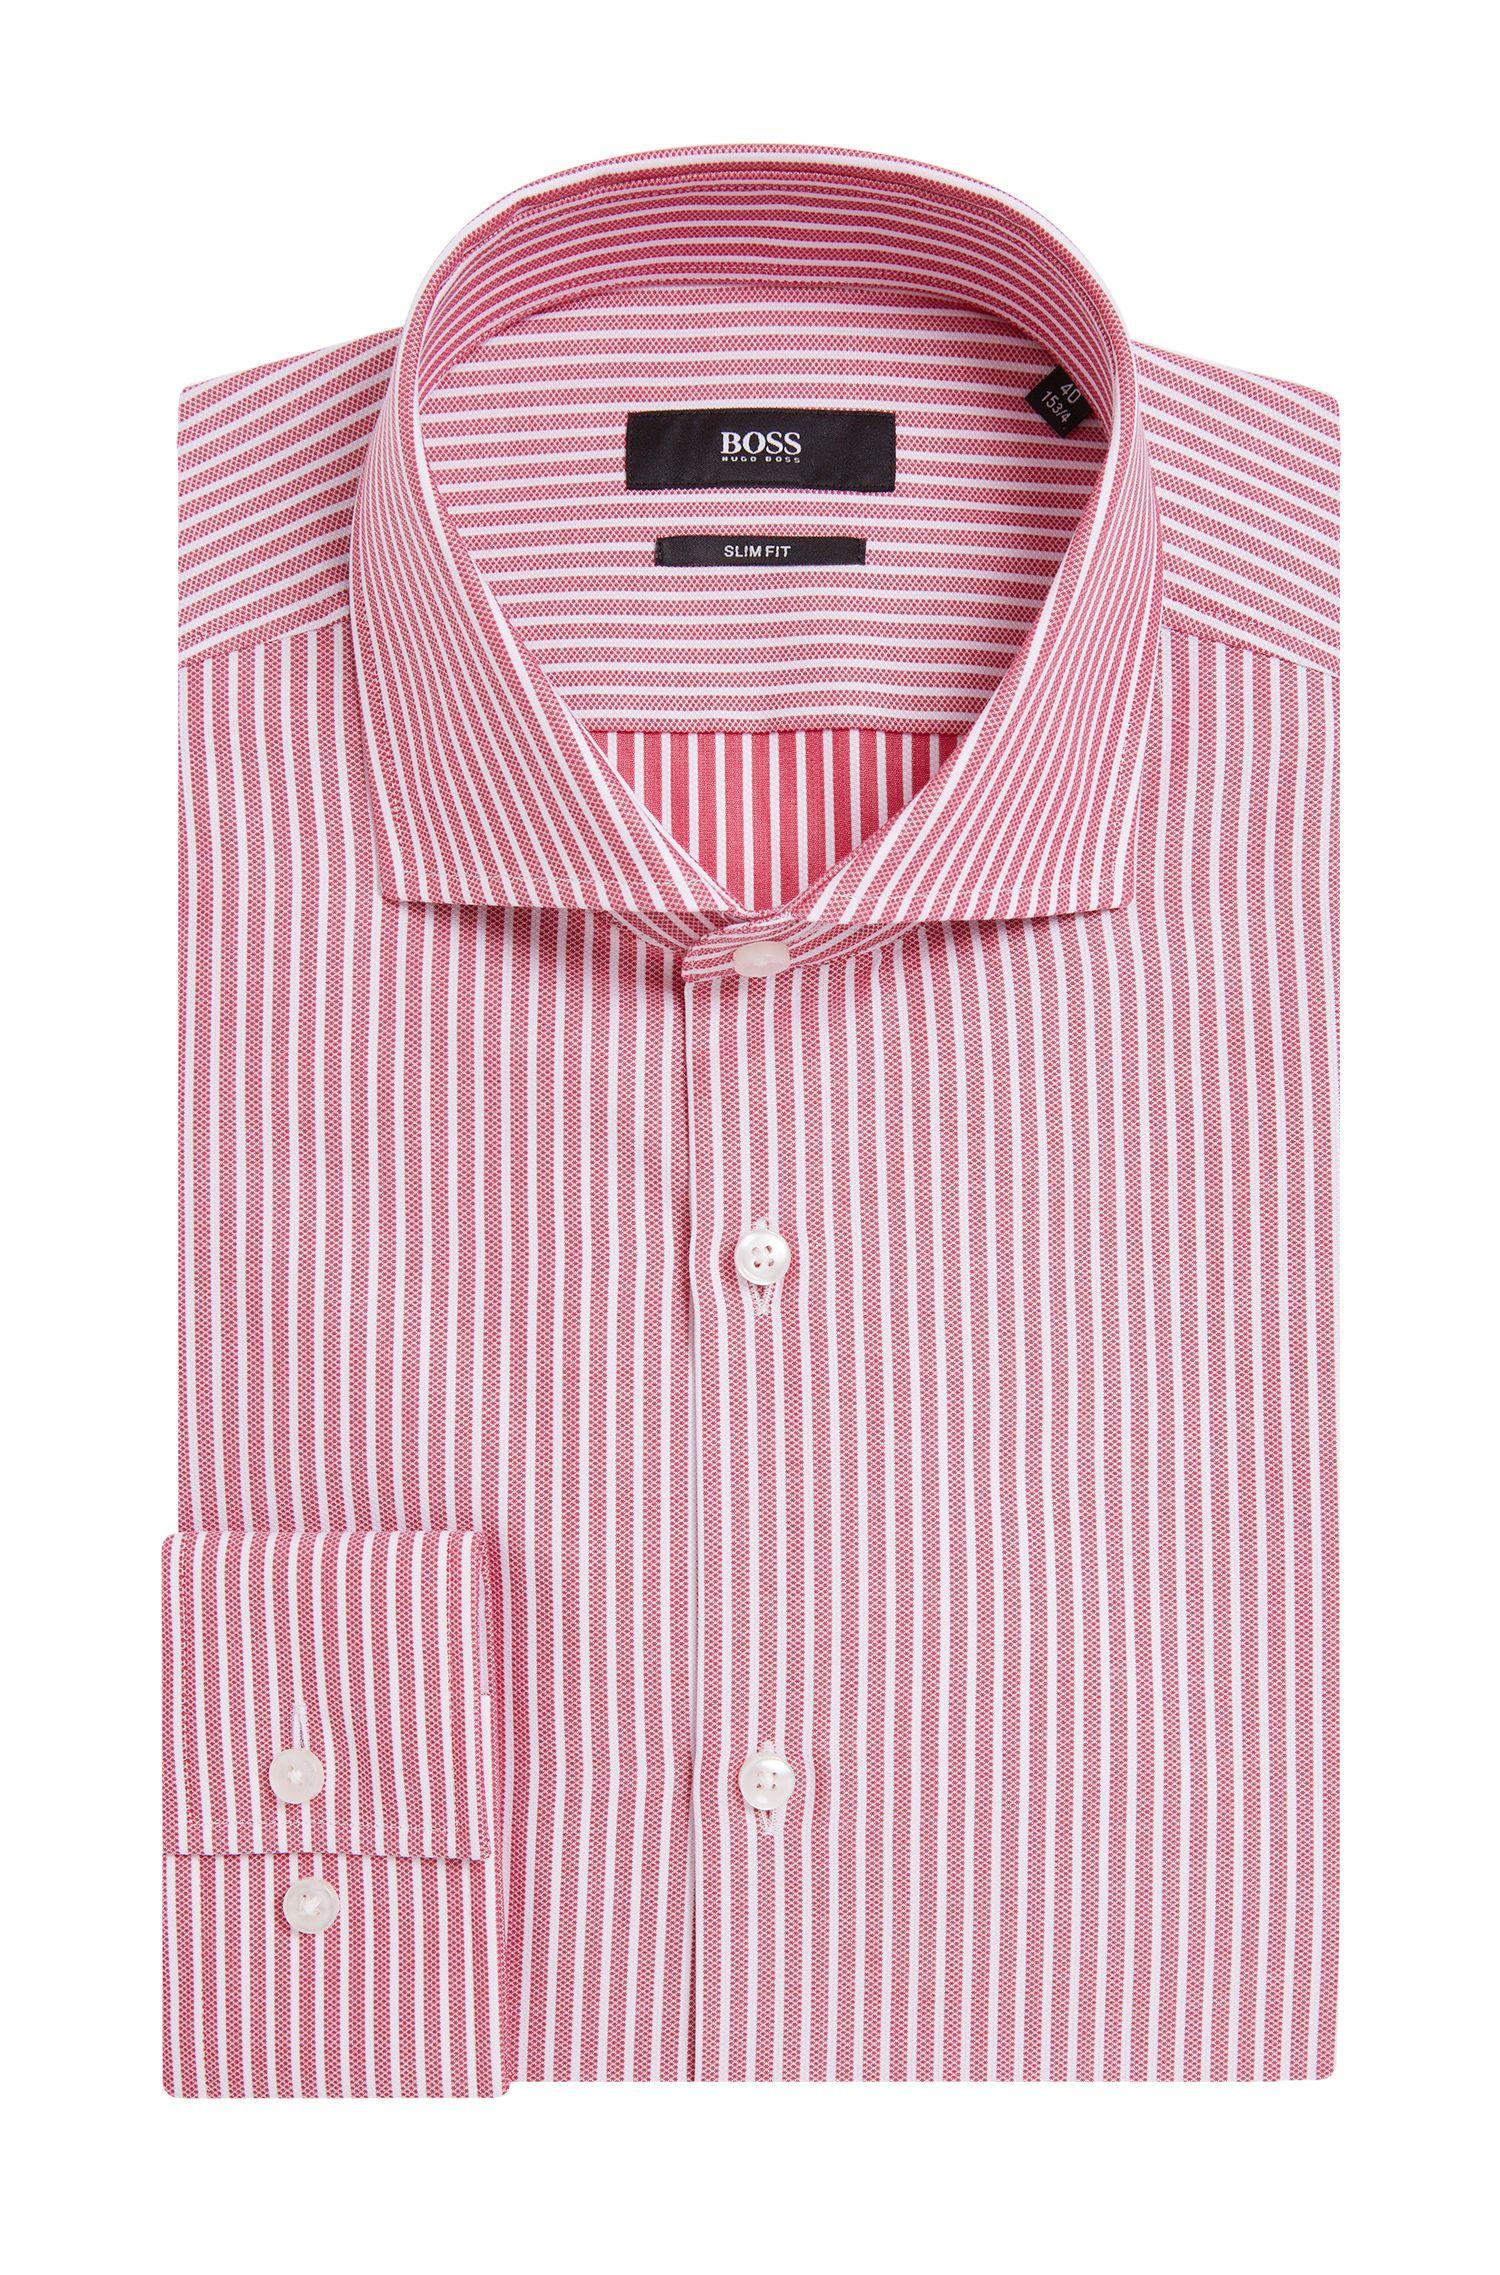 'Jason' | Slim Fit, Spread Collar Cotton Dress Shirt